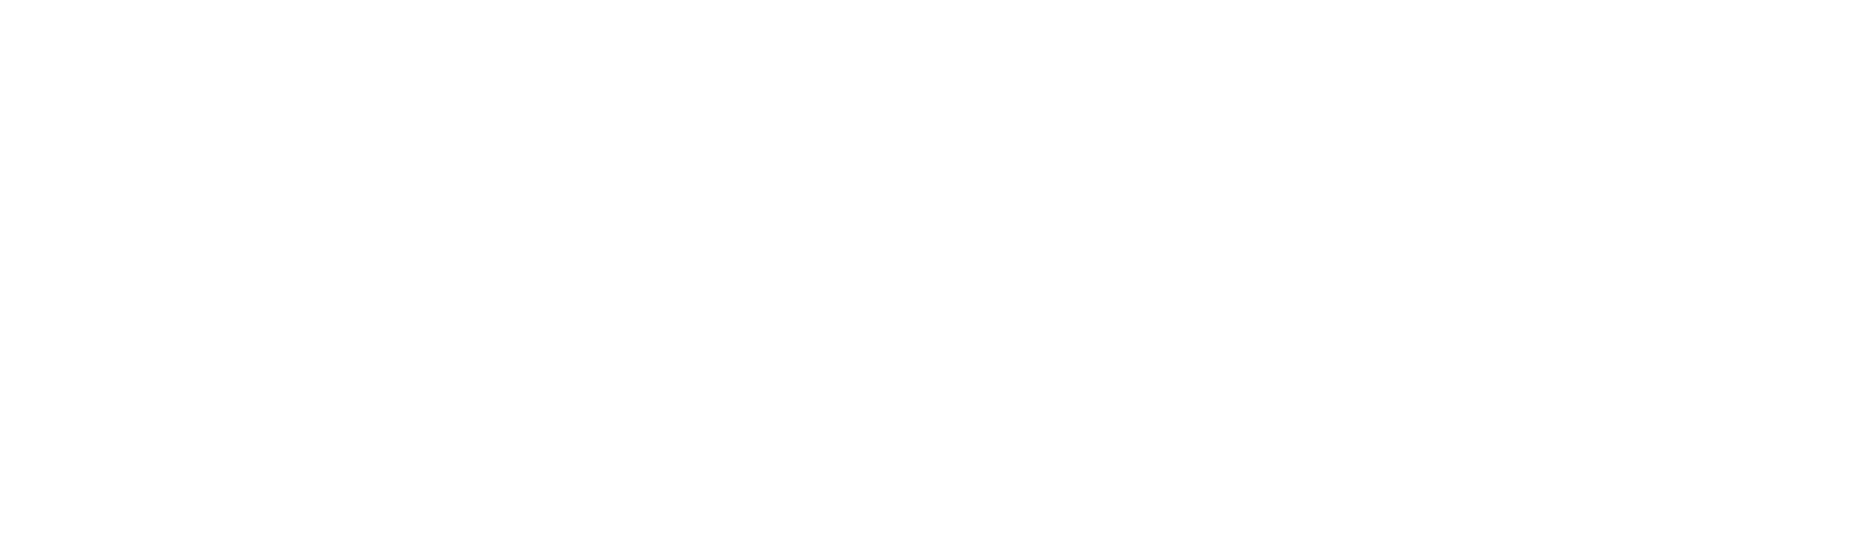 Ferrari Cofani